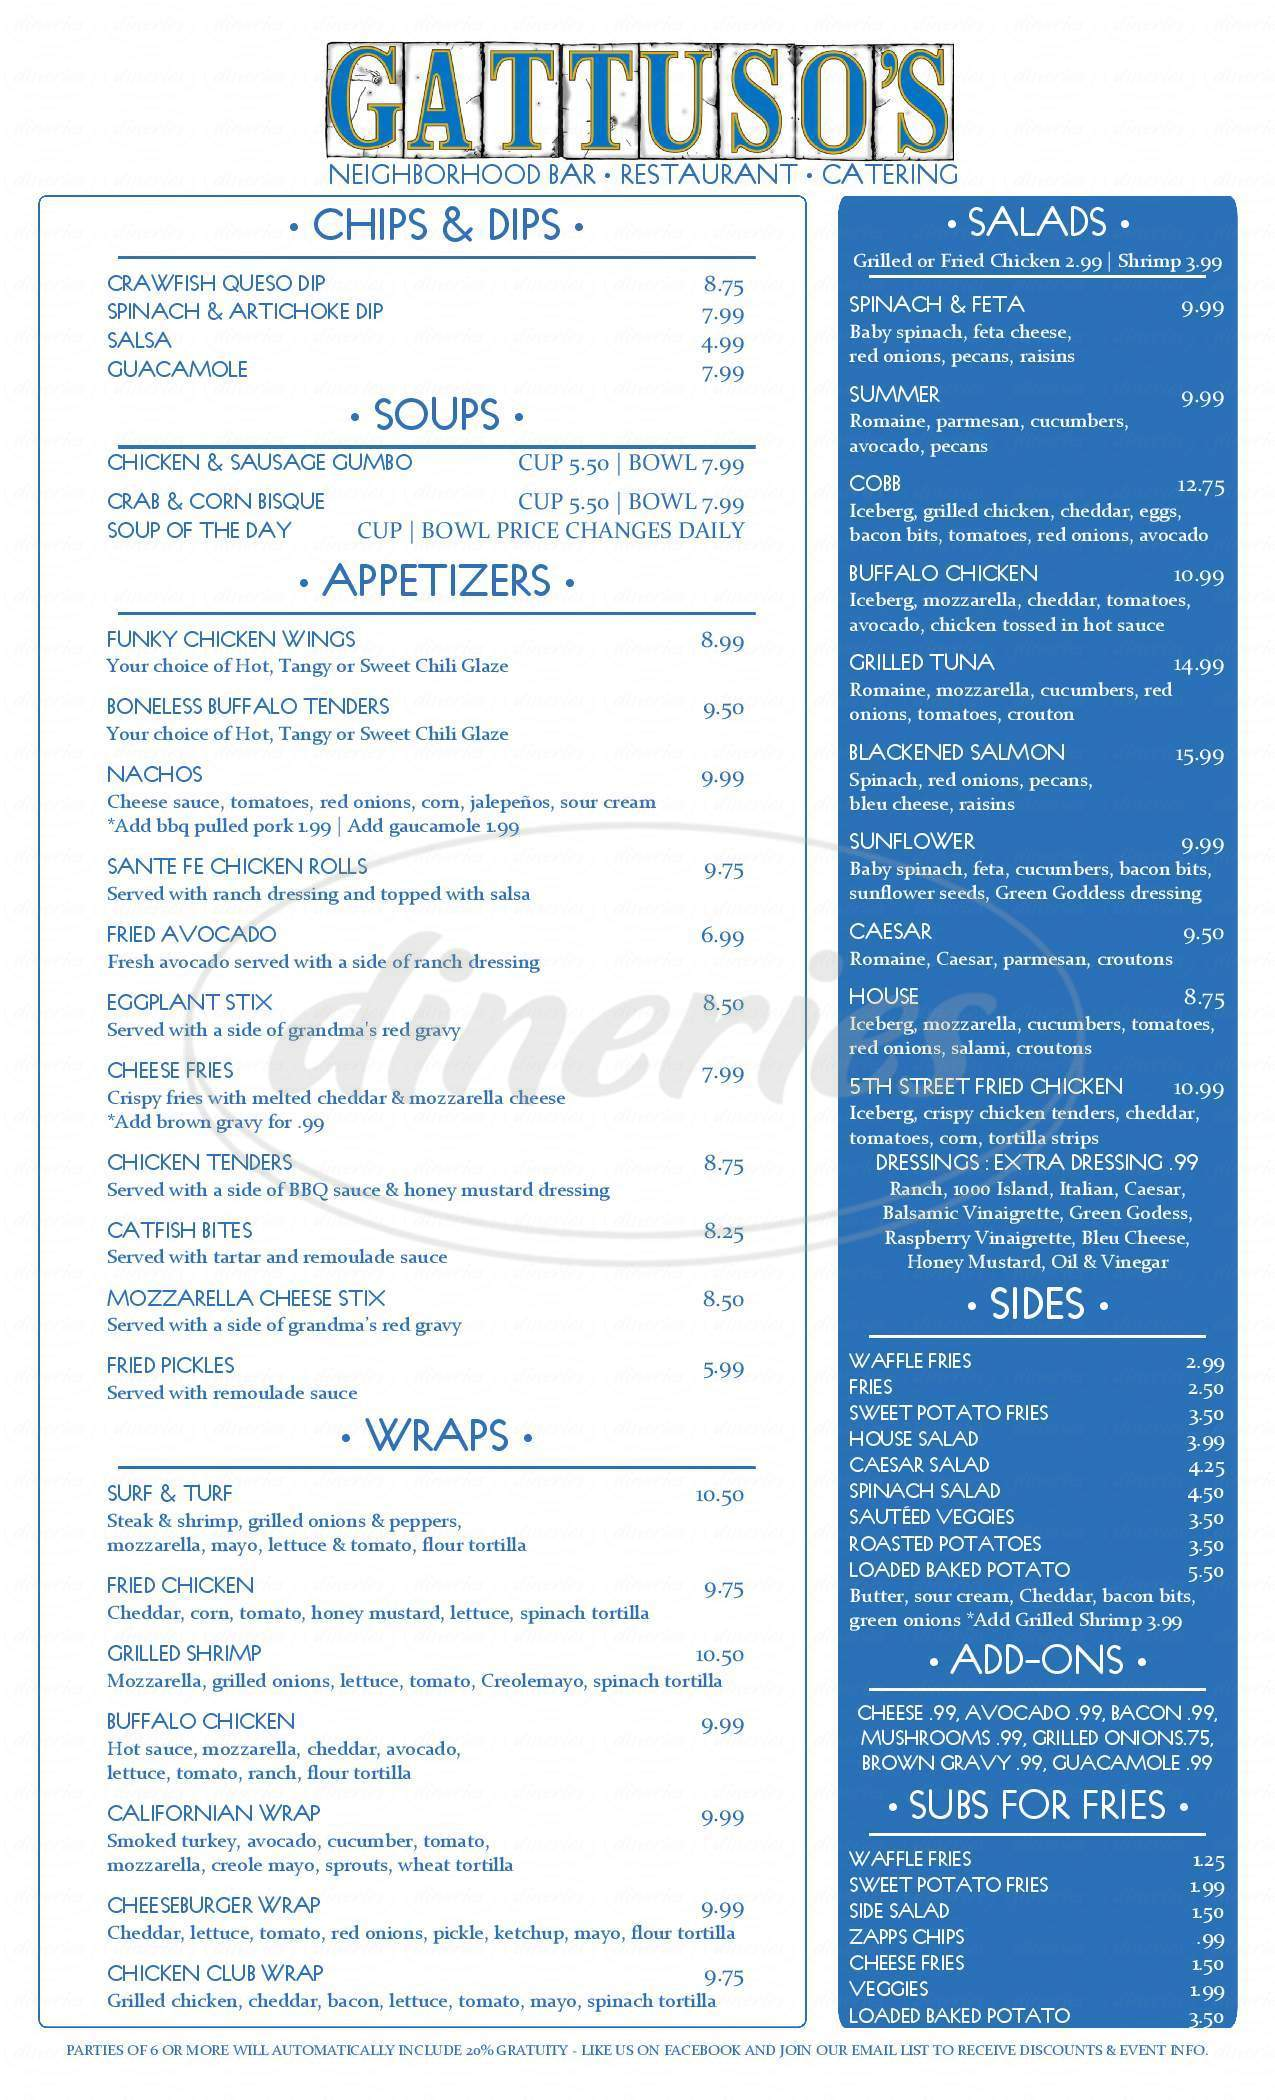 menu for Gattuso's Neighborhood Bar and Restaurant